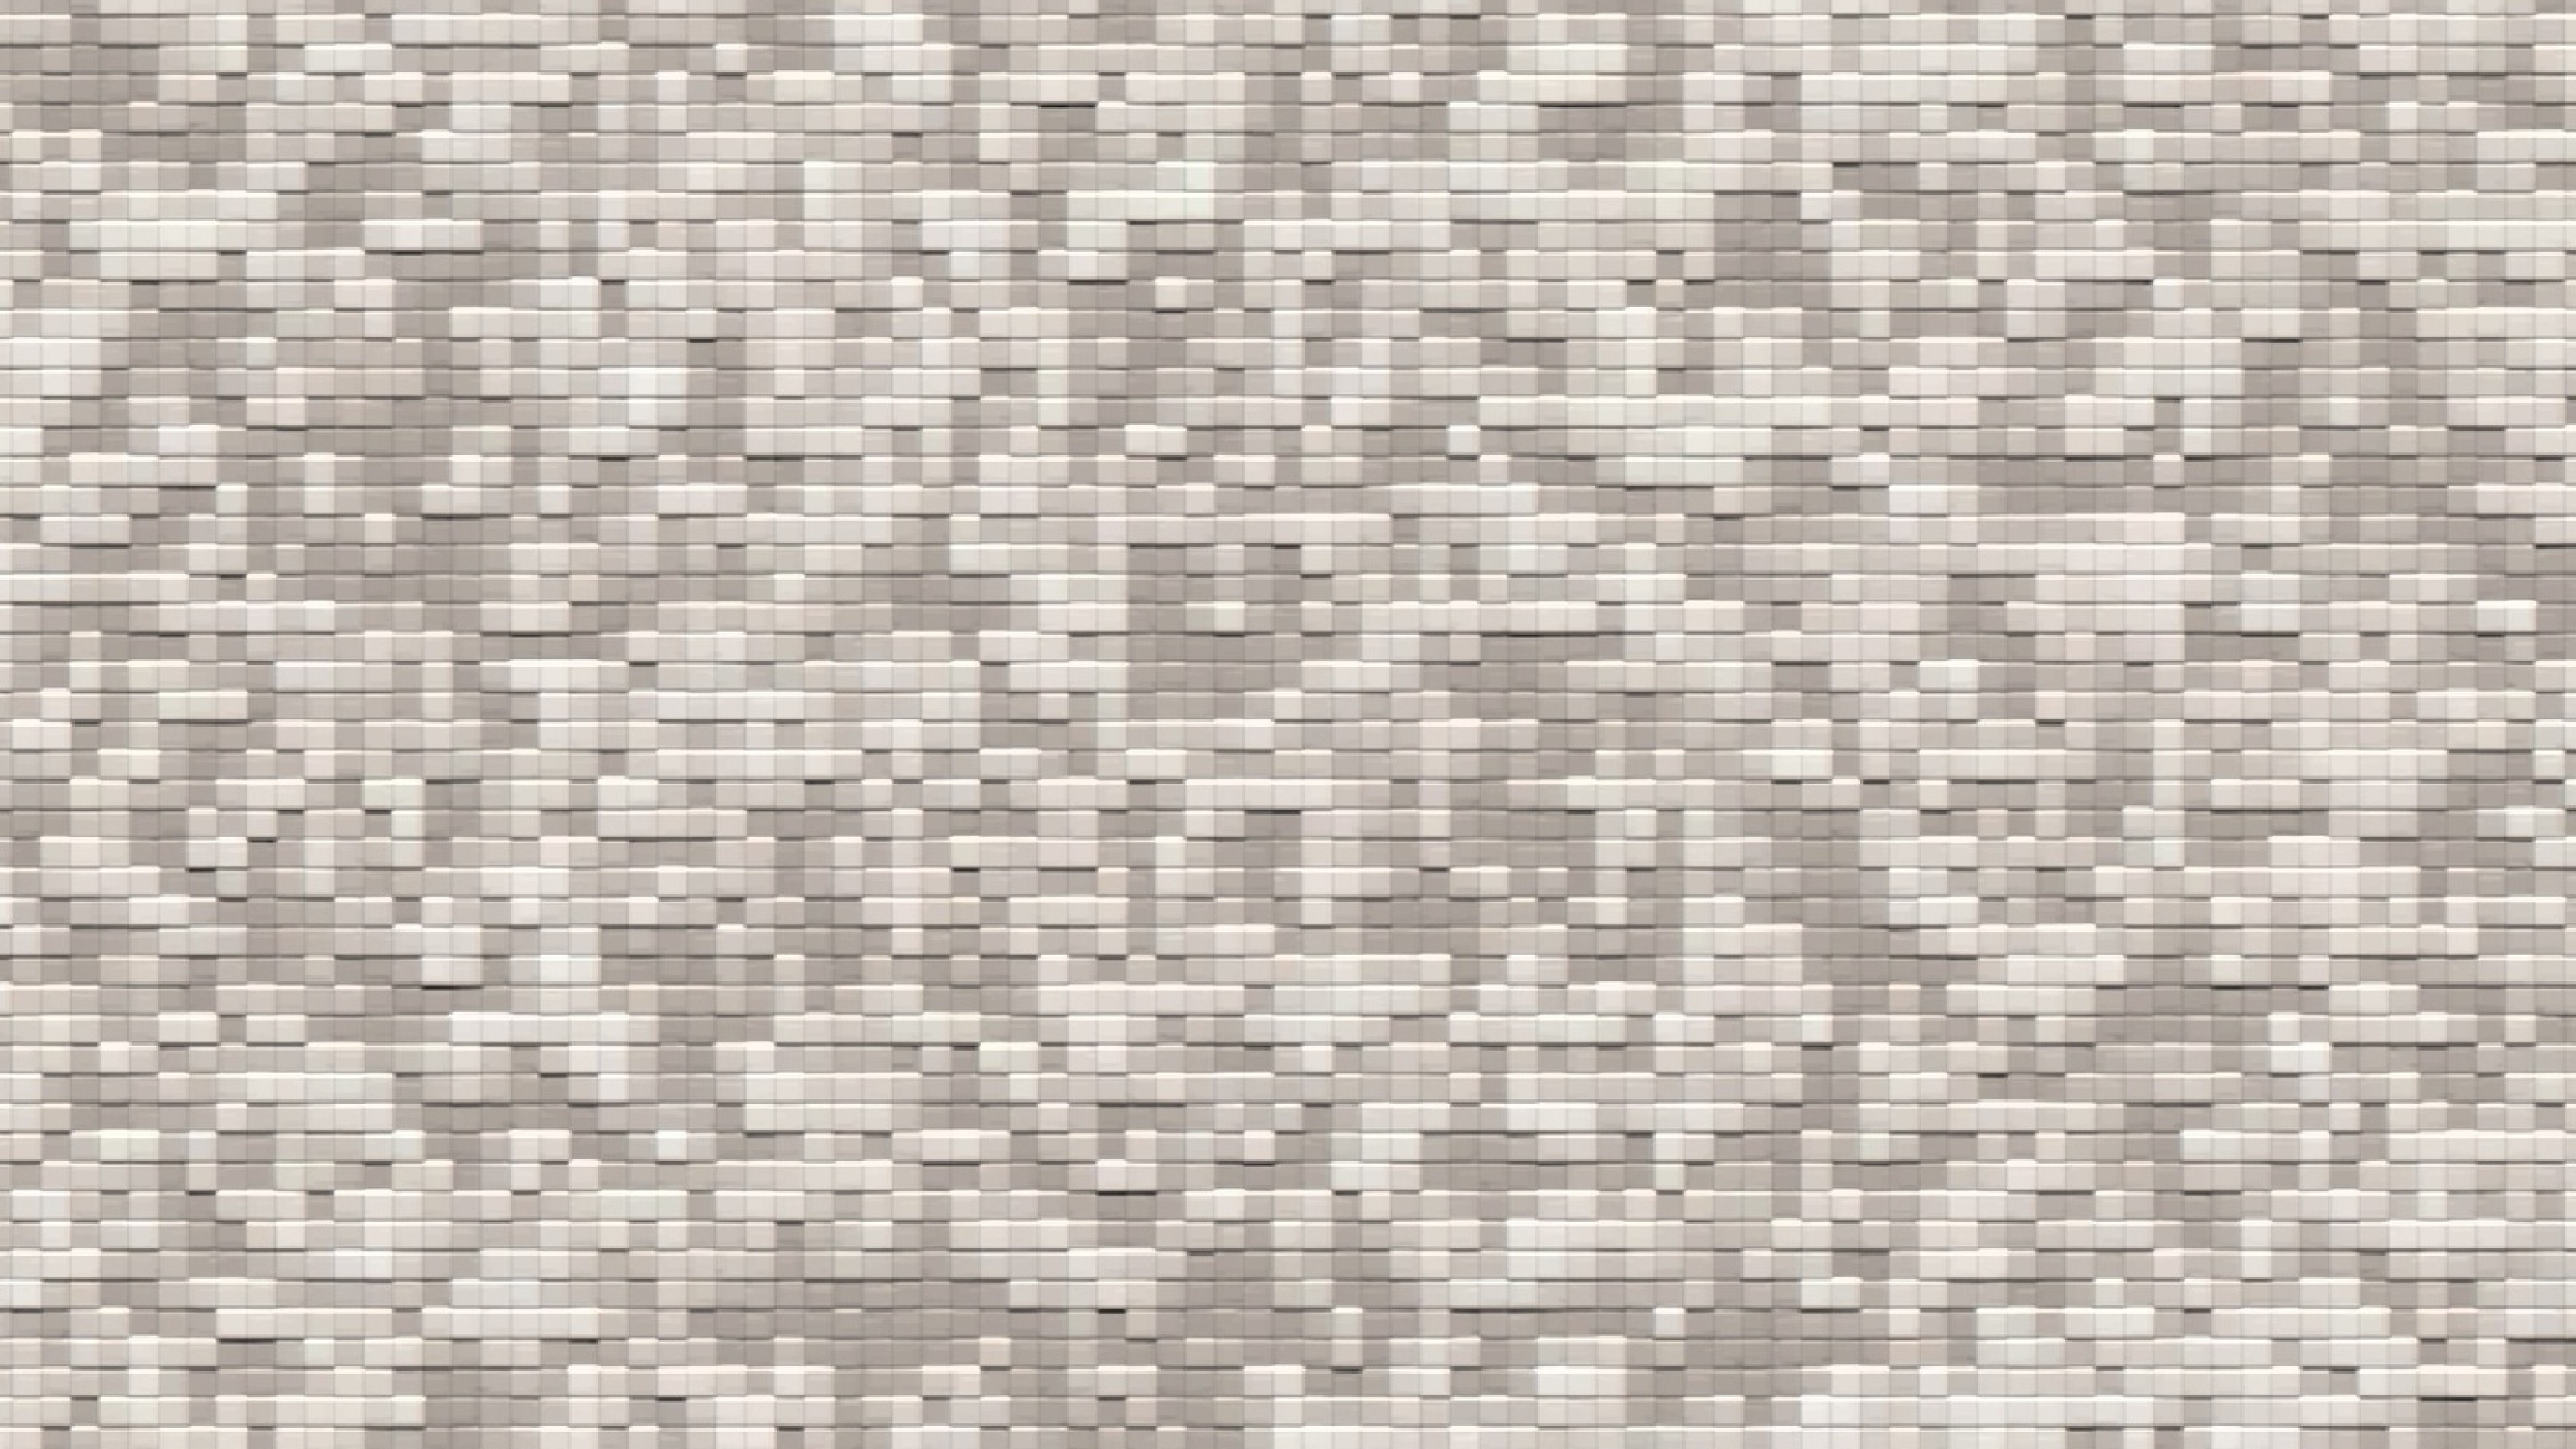 Digital Camo Iphone Wallpaper Hd